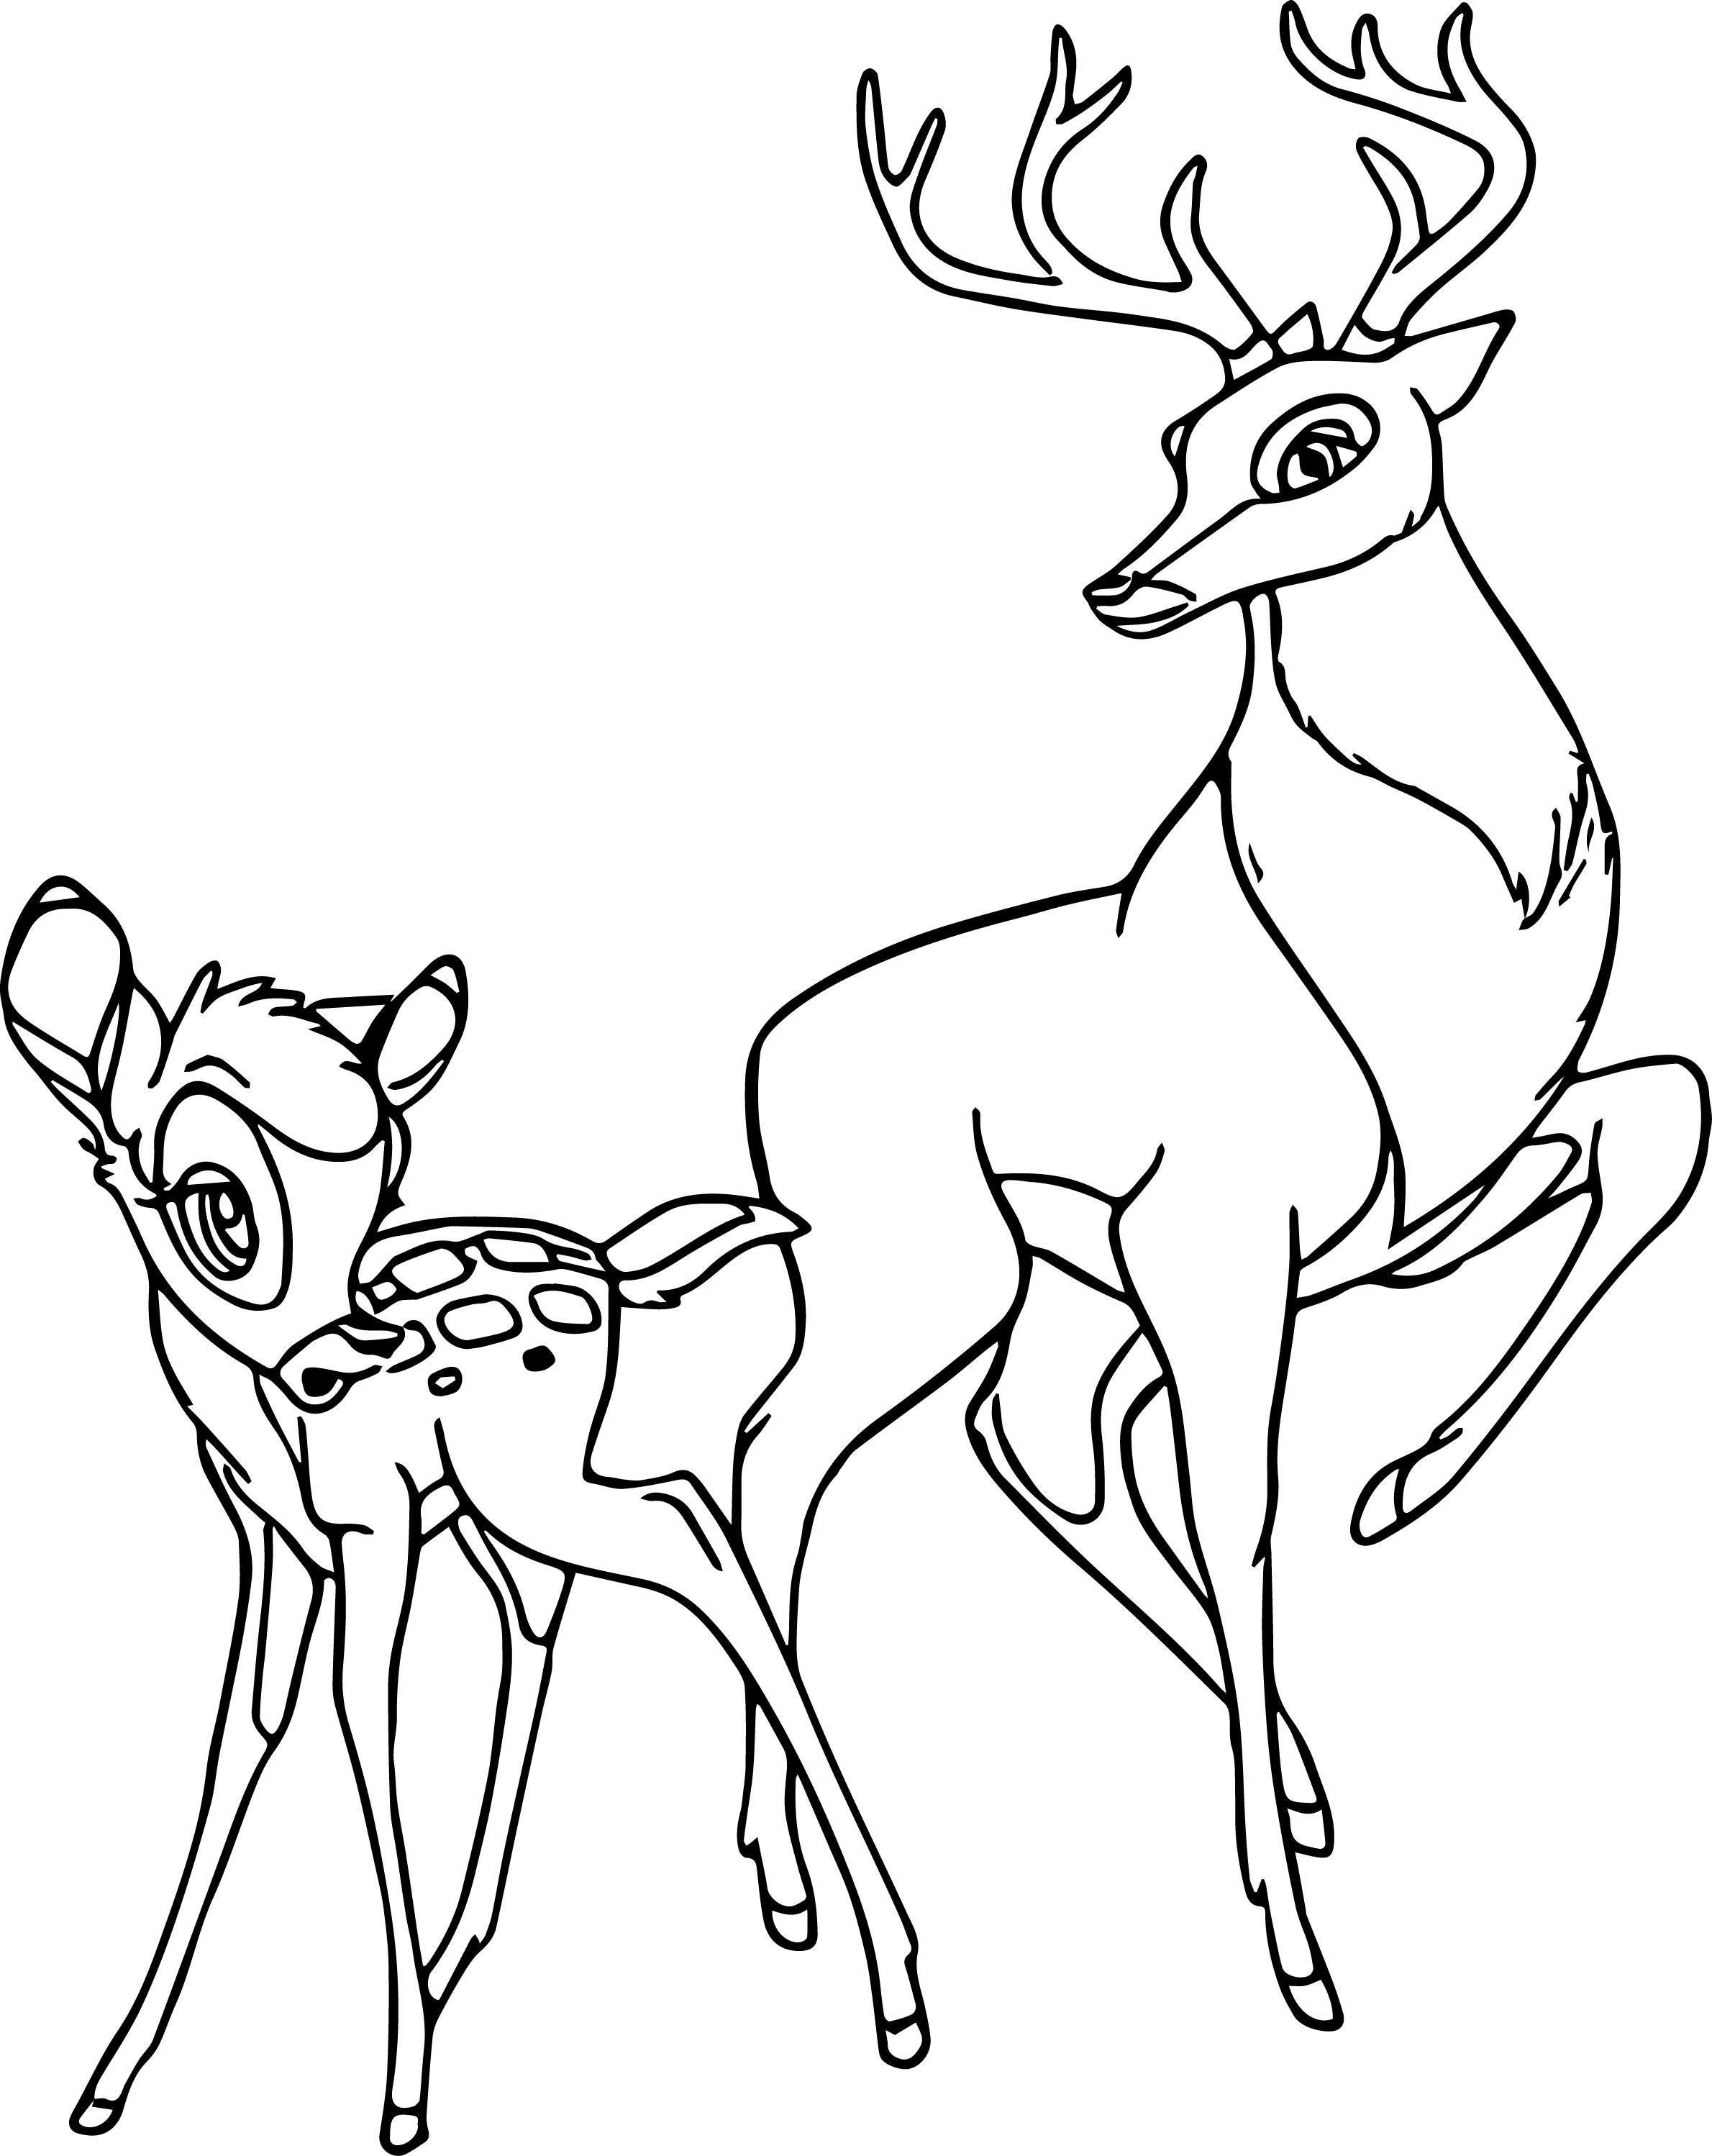 Bambi Prince Coloring Page